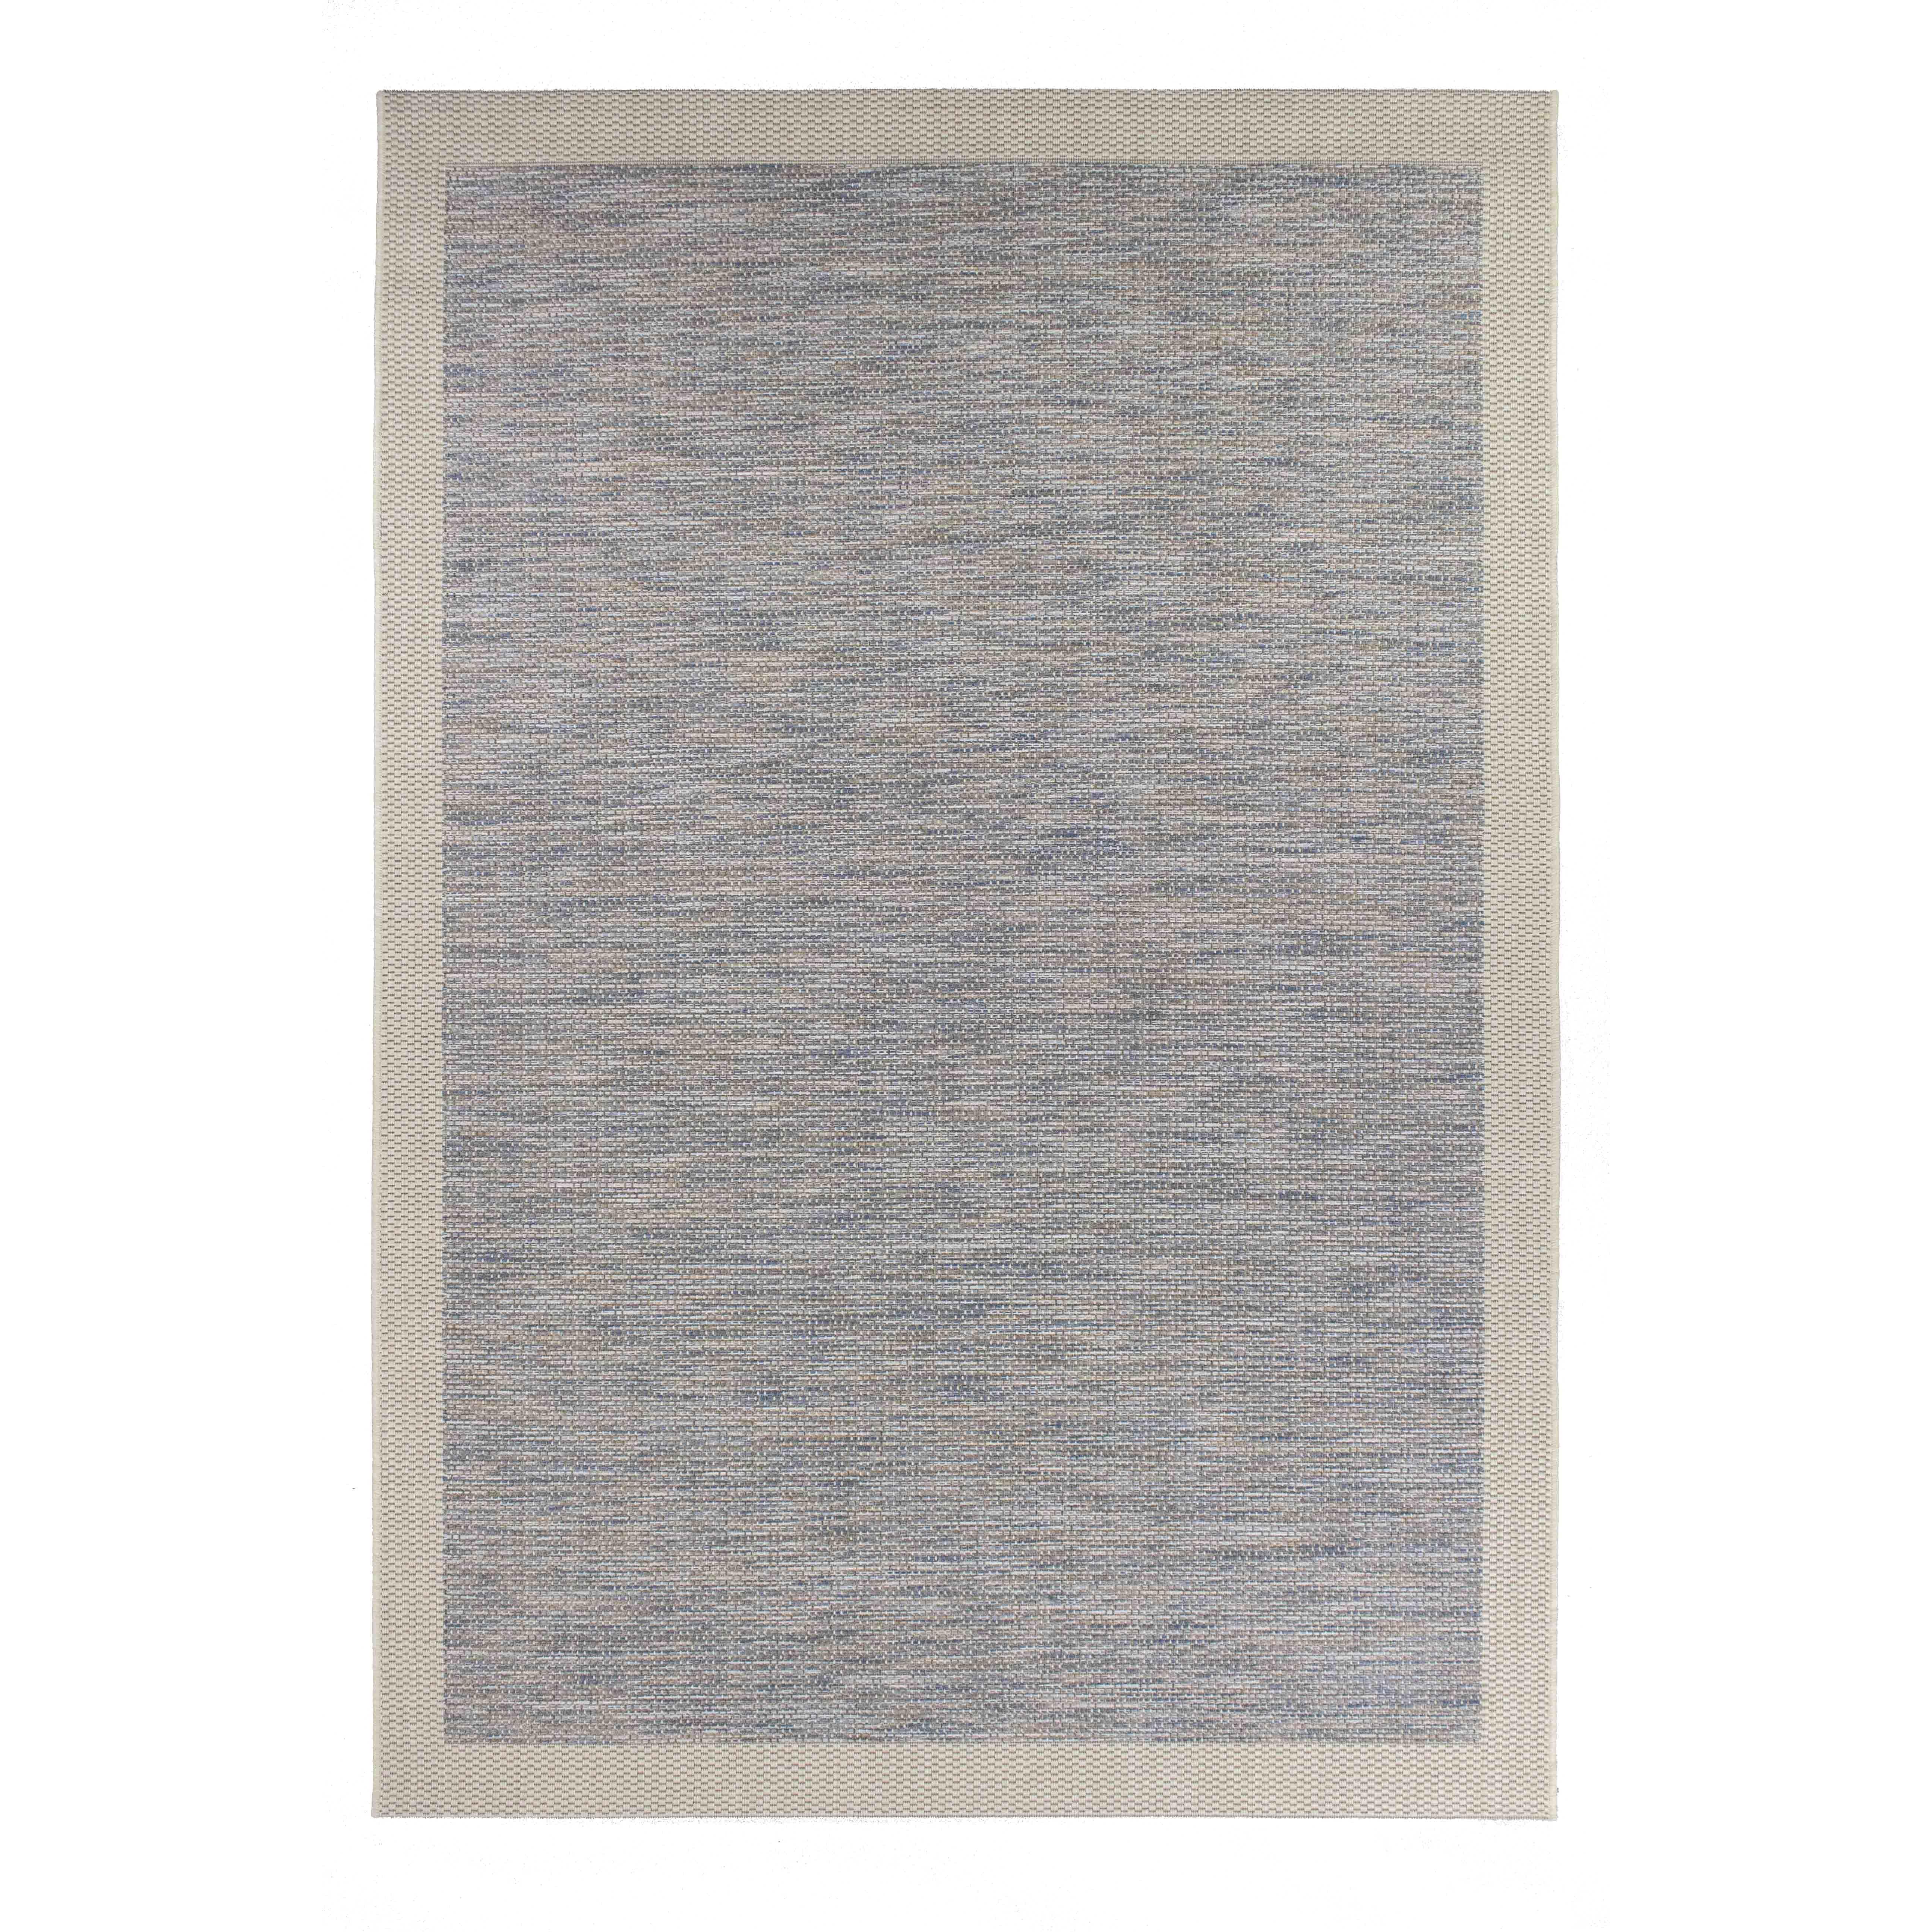 mcthree zephyr raw blue indoor outdoor area rug